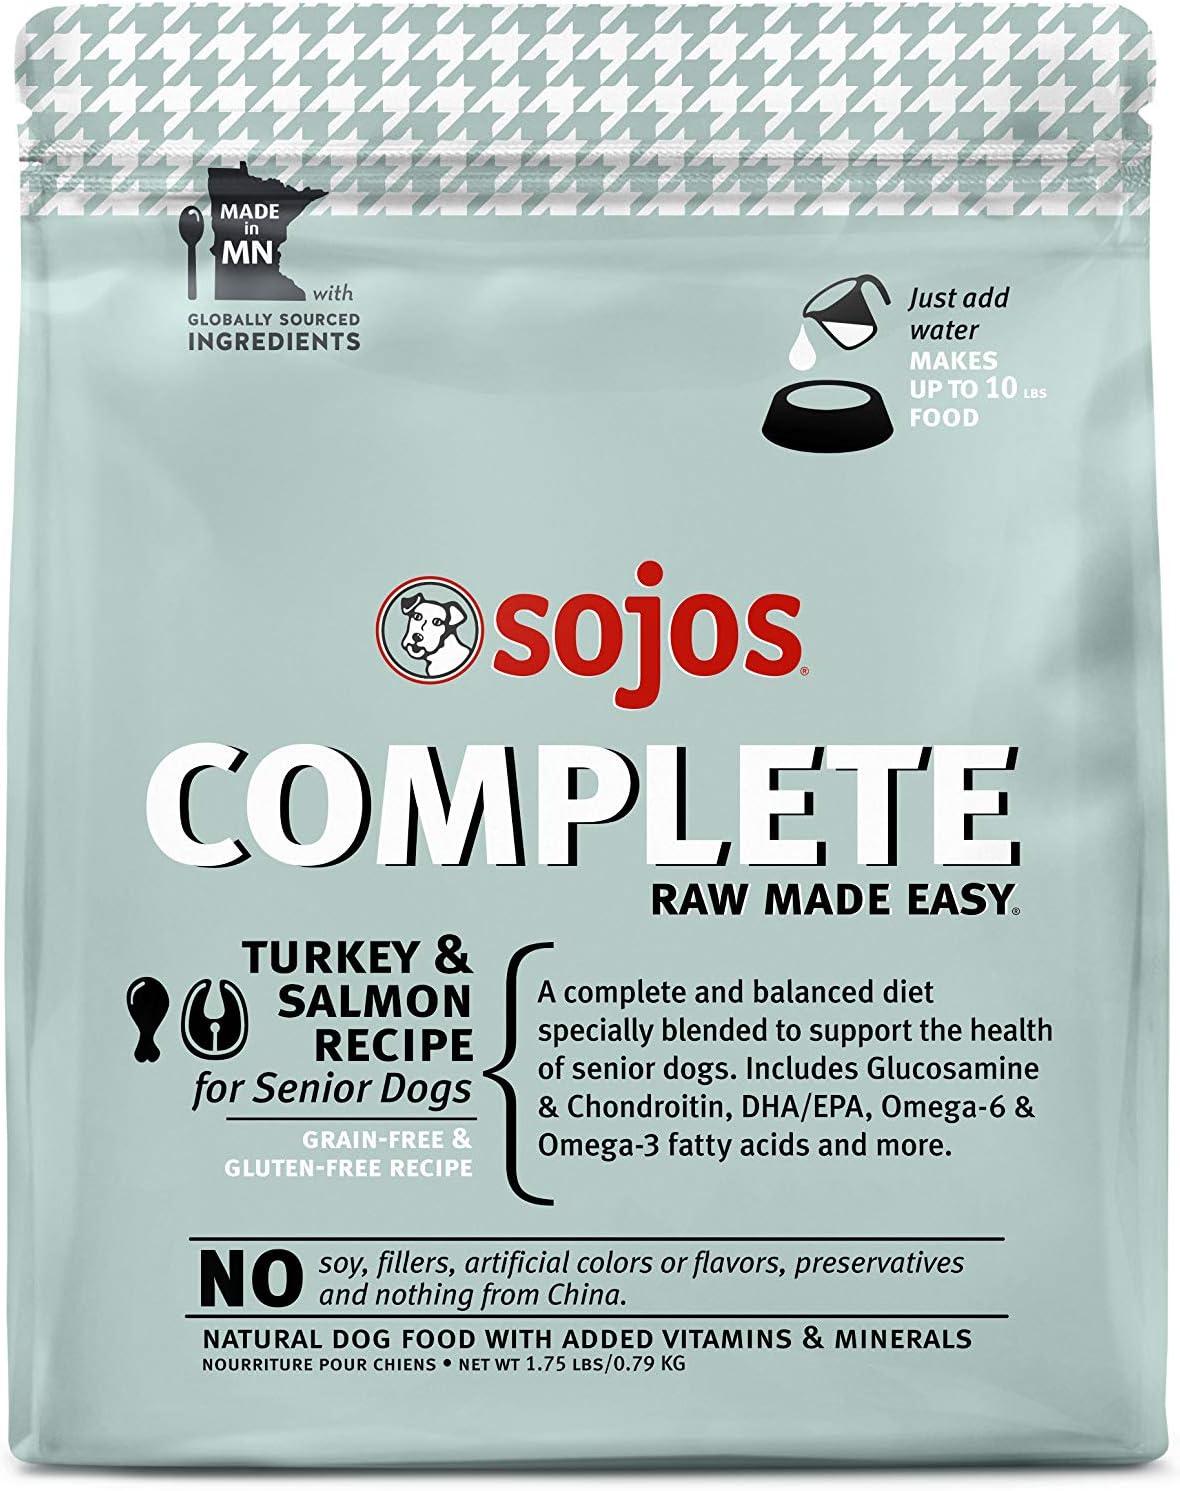 Sojos Complete Turkey & Salmon Recipe Senior Grain-Free Freeze-Dried Raw Dog Food, 1.75 Pound Bag